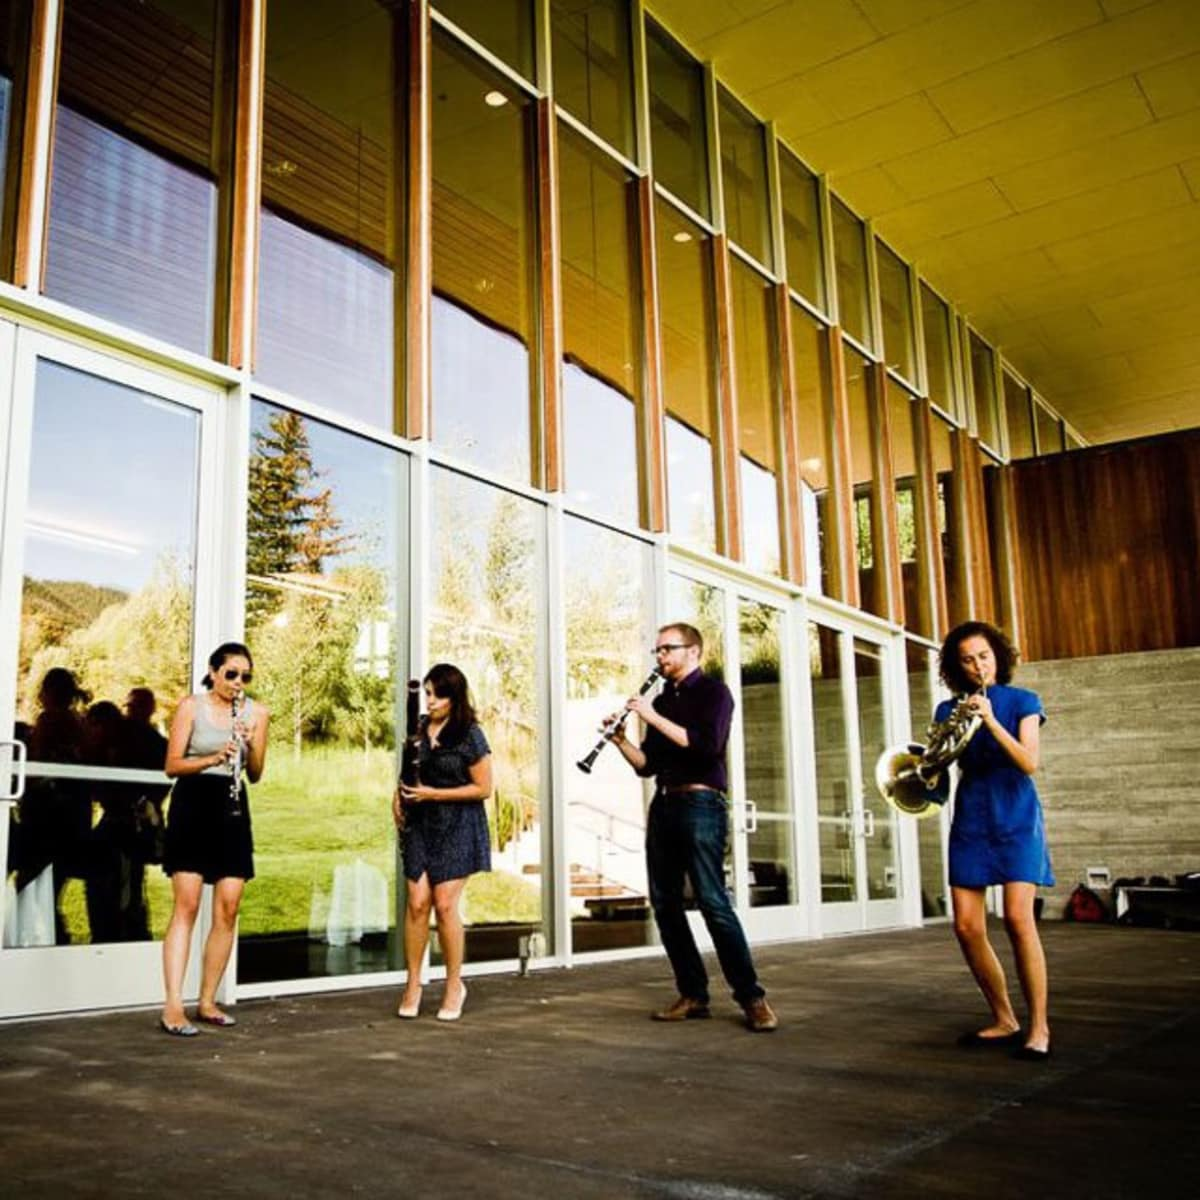 Nancy, Windsync, Garrett Hudson, Erin Tsai, Tracy Jacobson, Jack Marquardt, Anni Hochhalter at Jackson Hole Center for the Arts